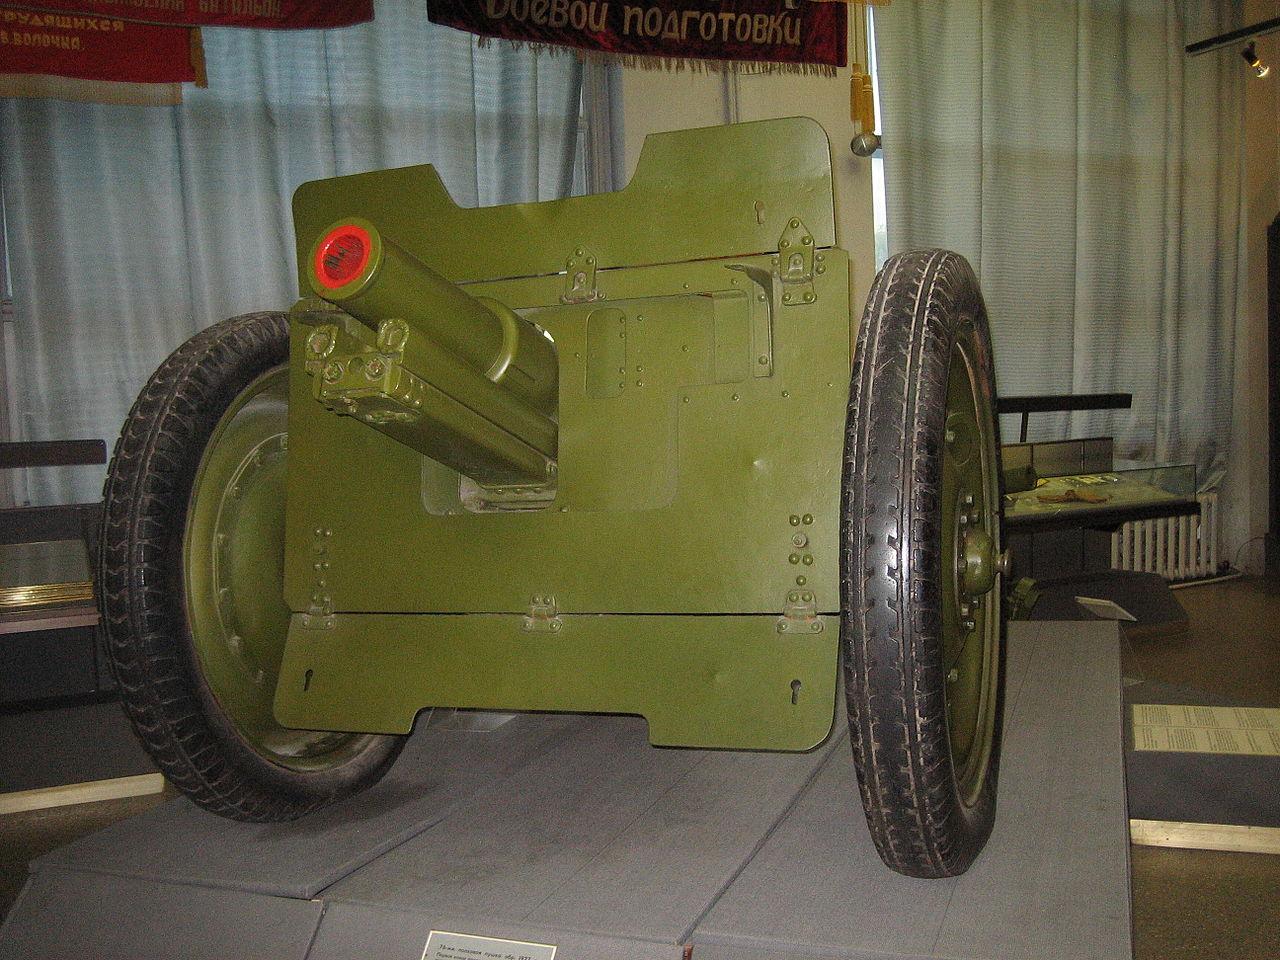 1280px-Regimental_gun_76mm_1927_Moscow_3